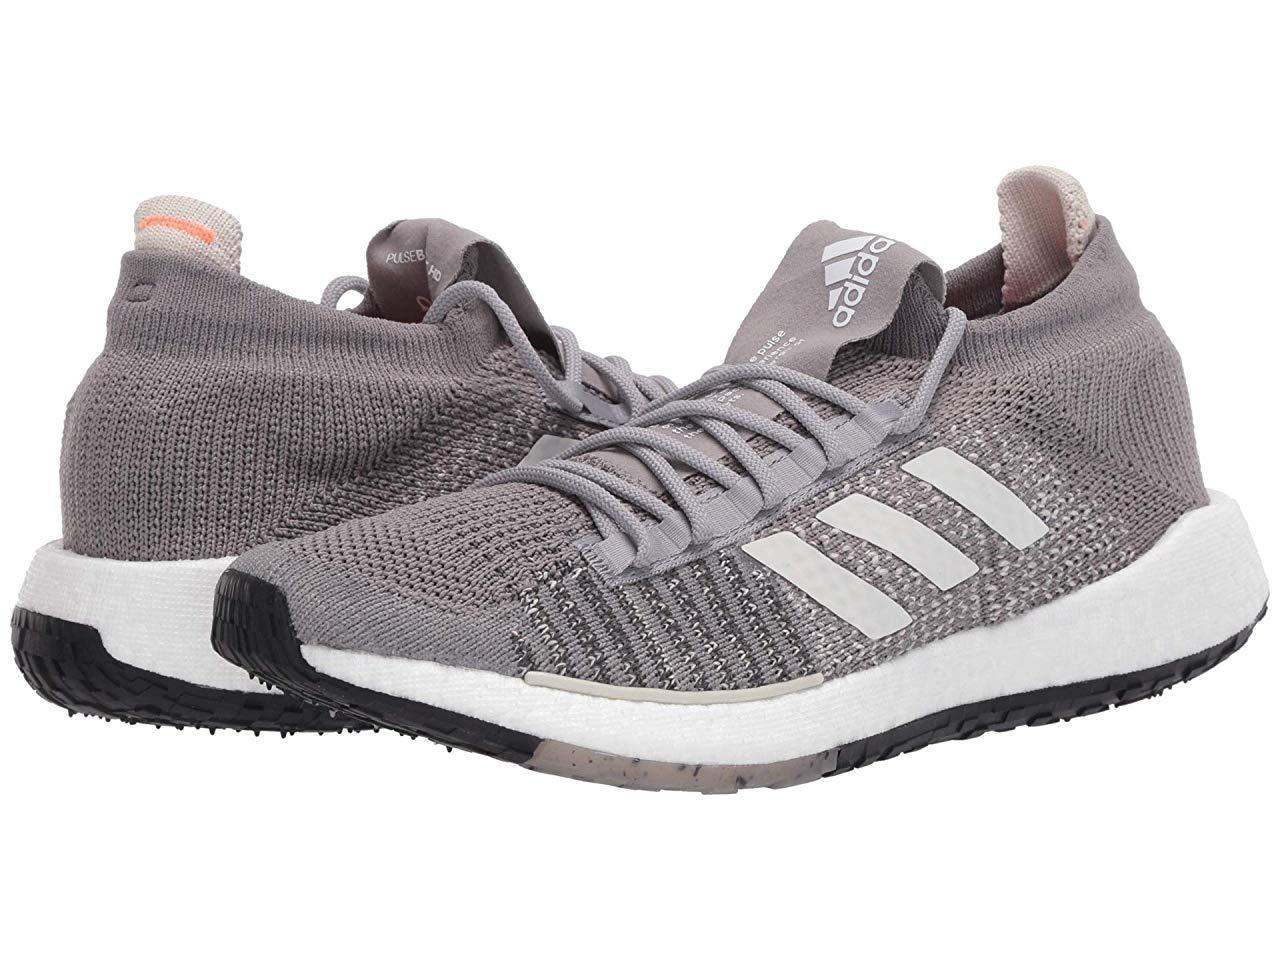 Кроссовки/Кеды (Оригинал) adidas Running PulseBOOST HD Dove Grey/Footwear White/Alumina